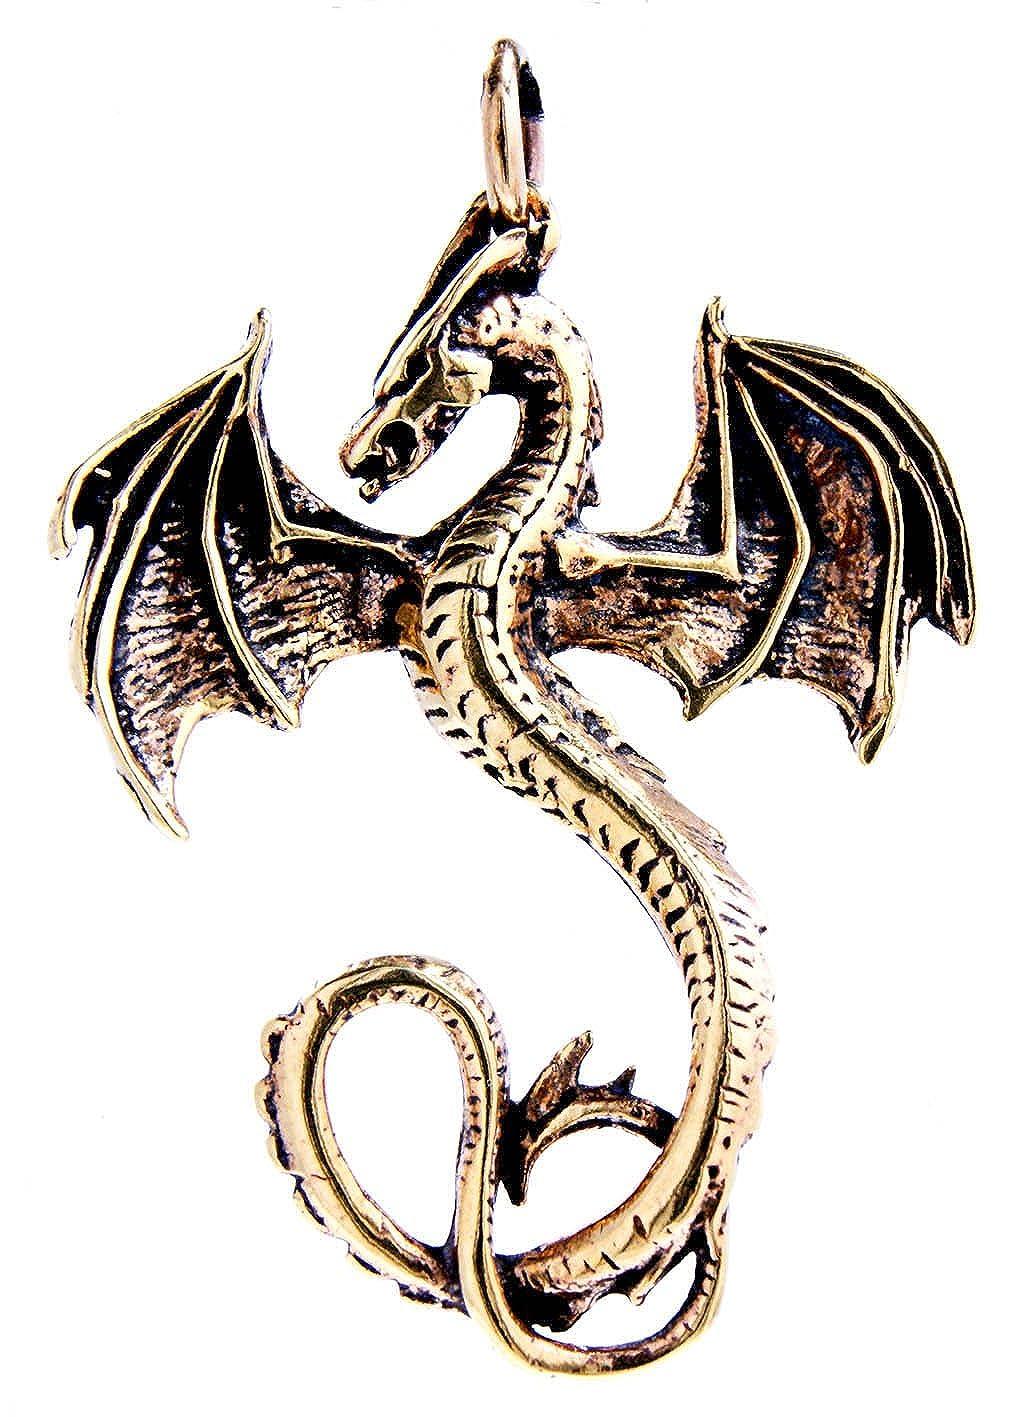 Groß er Drachen Anhä nger aus Bronze Nr. 11 Eastern Gems ABC-136